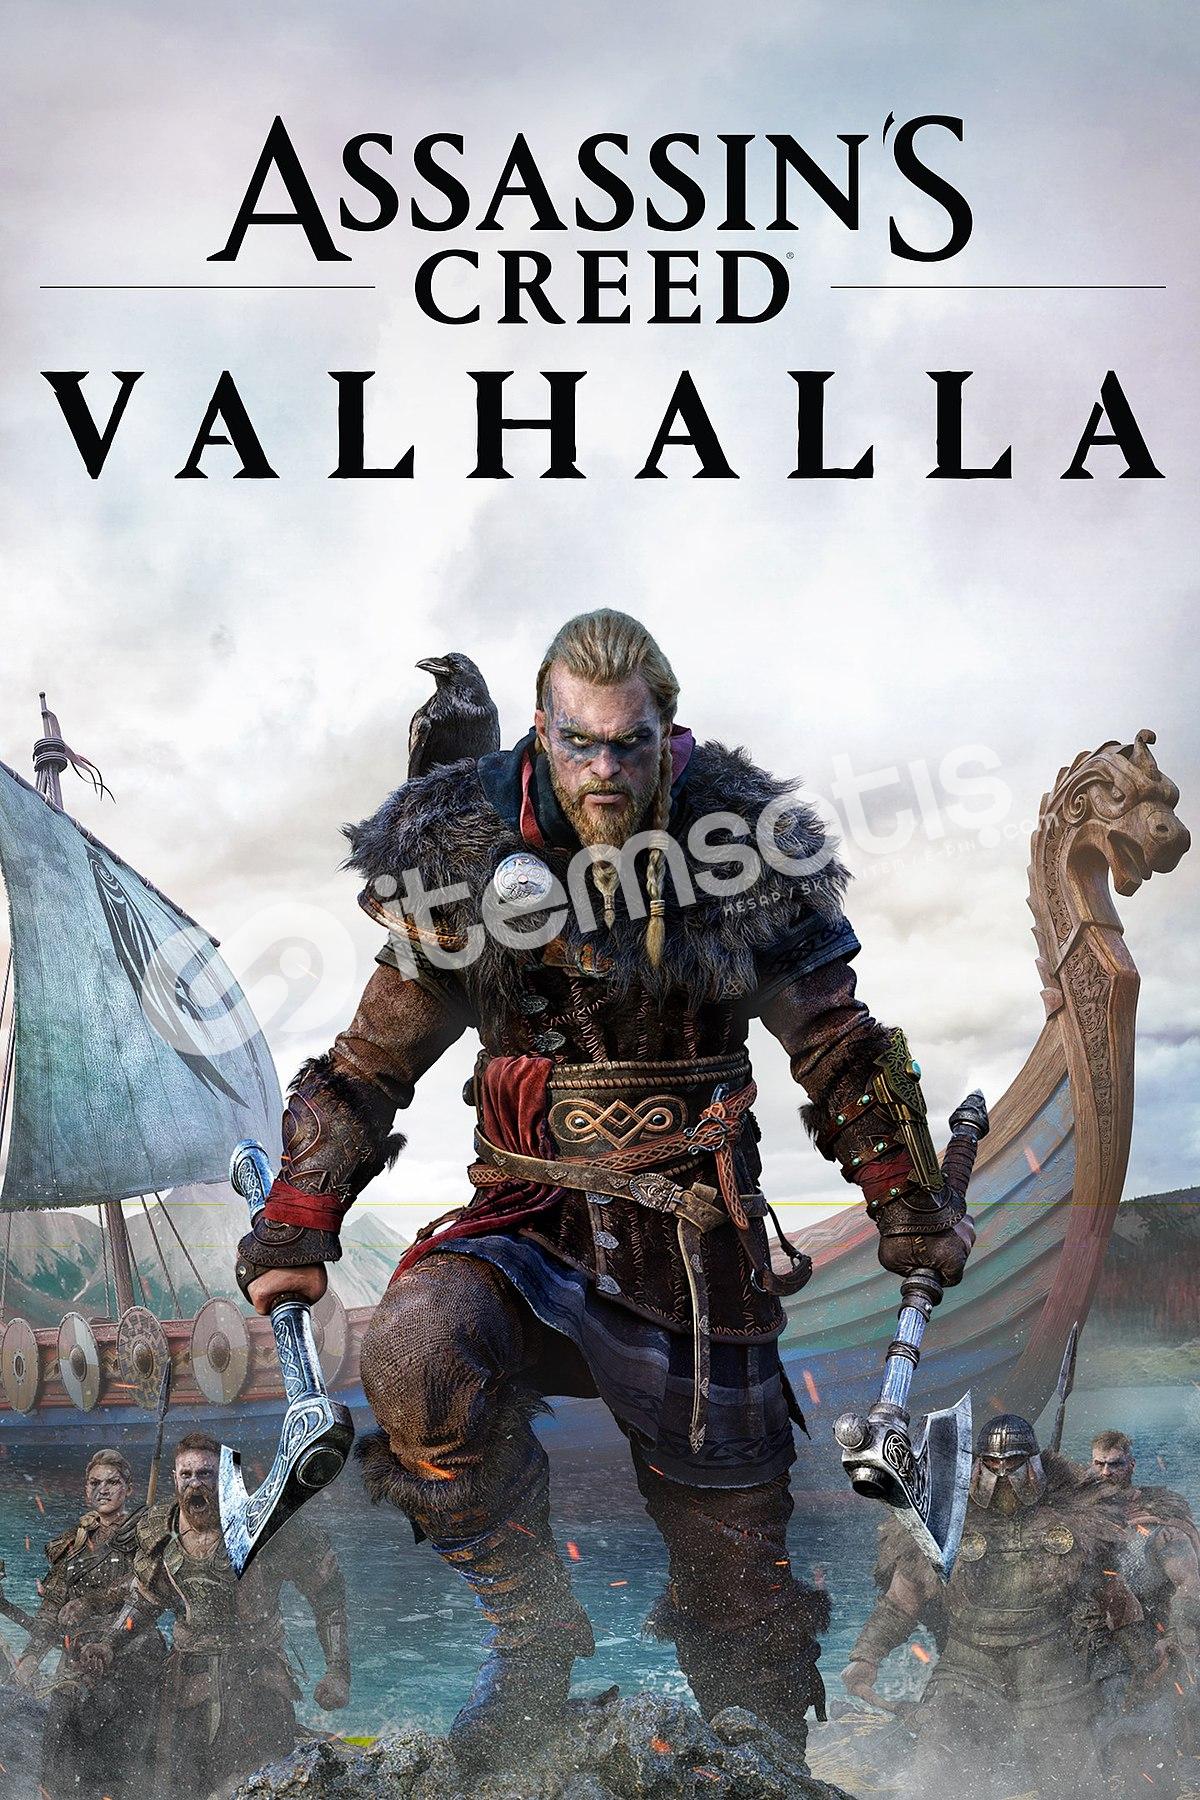 Assassin's Creed Valhalla + Rainbow Six Siege + Watch Dogs 2